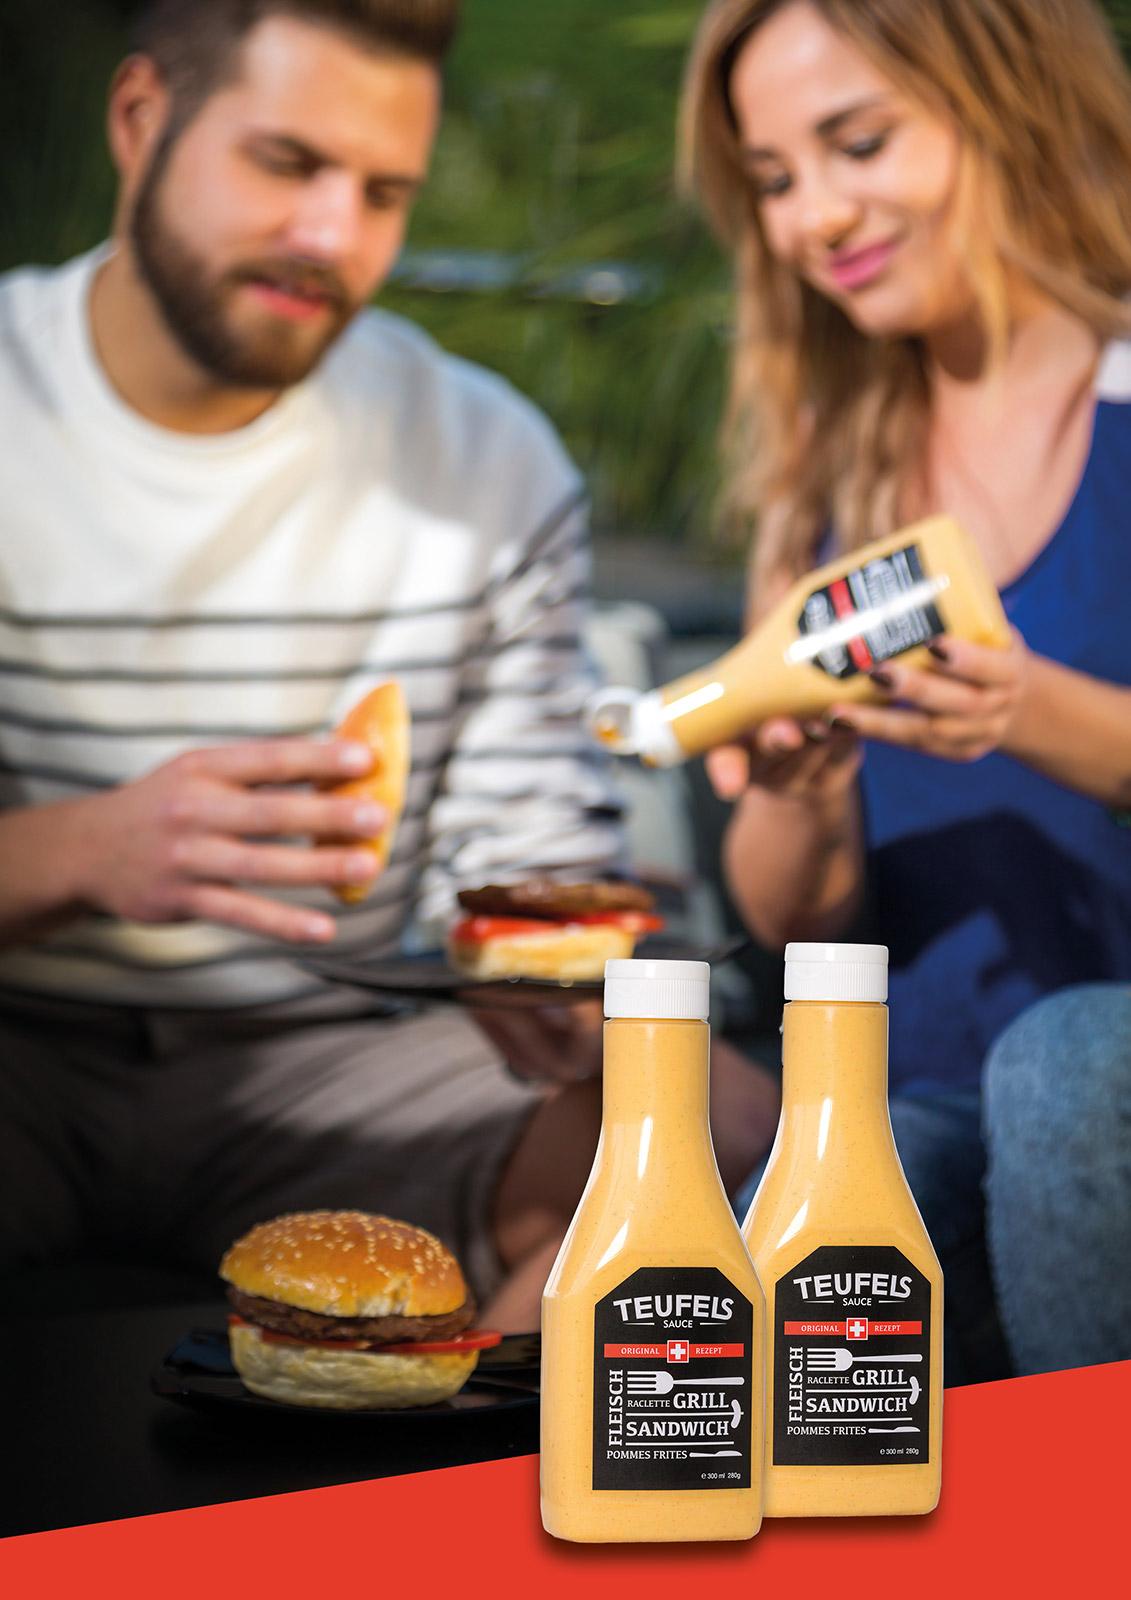 Produktfoto/Werbeaufnahme inkl. Plakatgestaltung